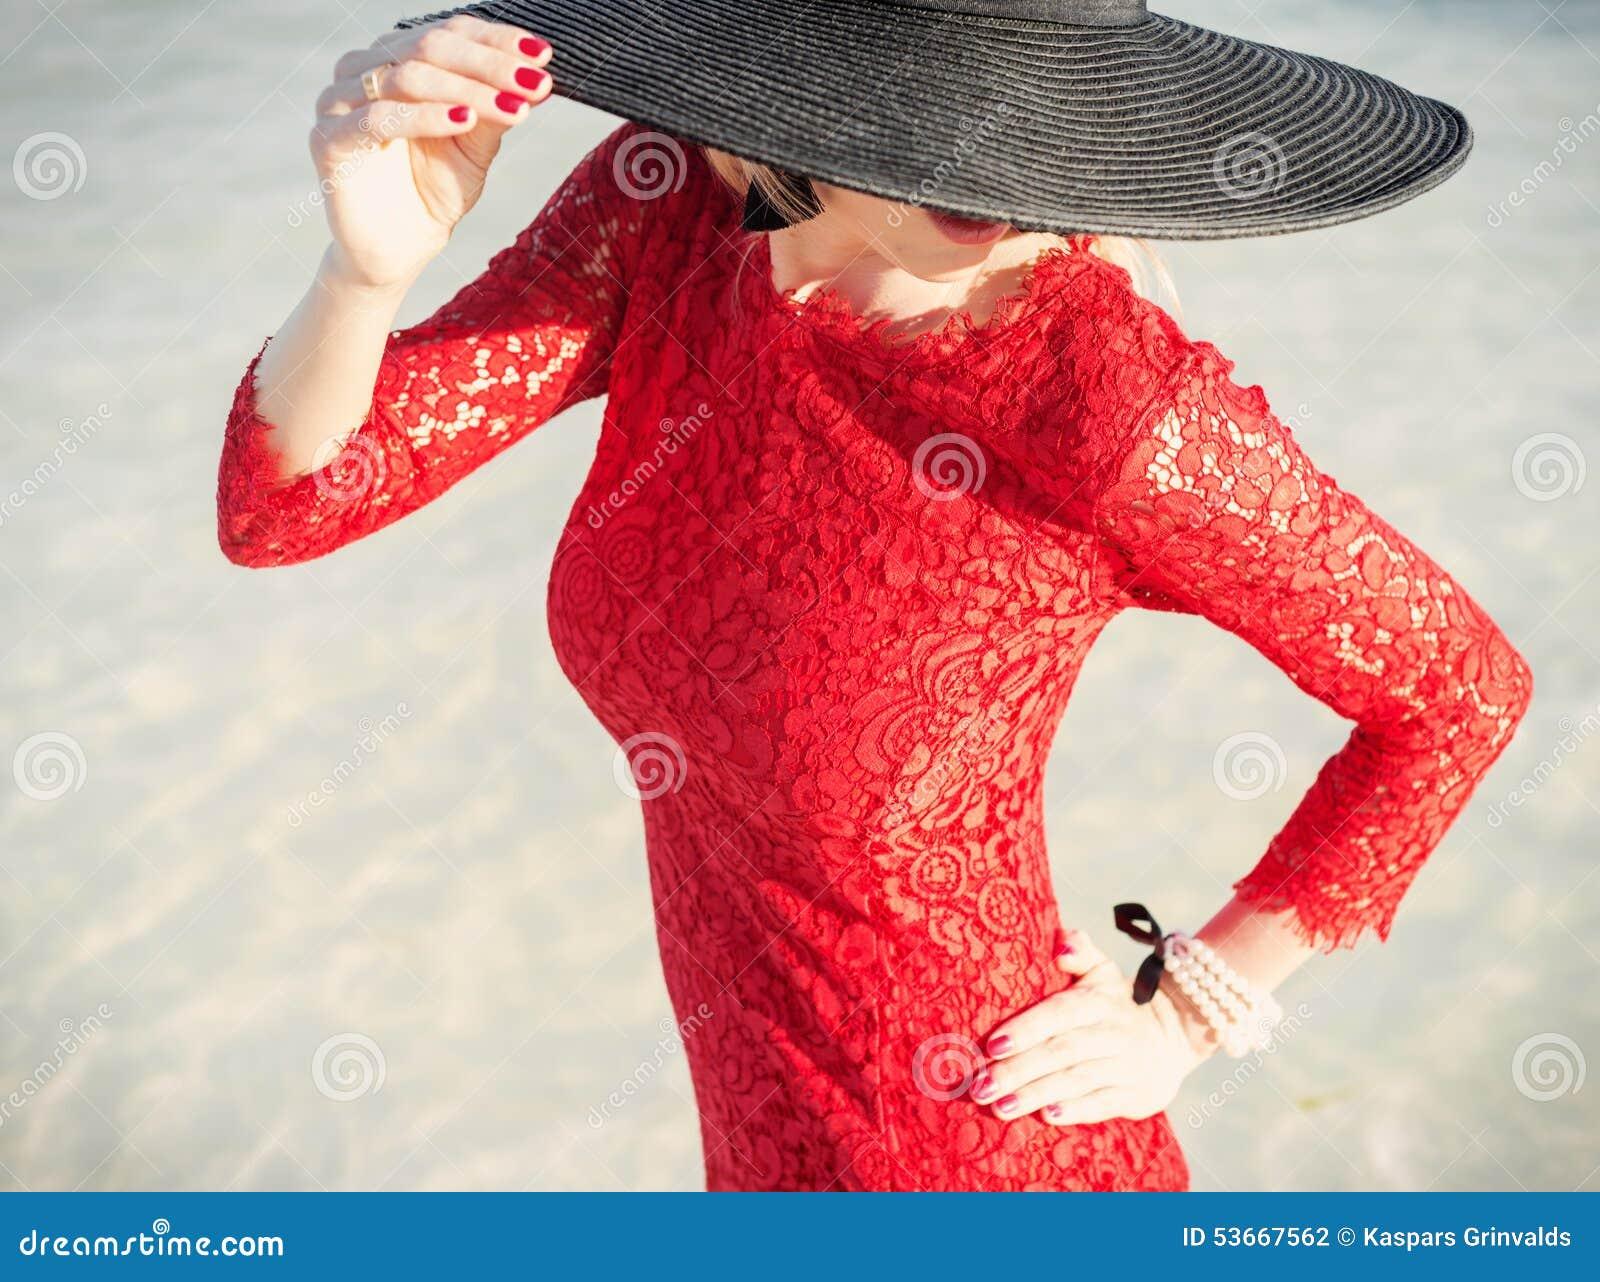 Stylish Woman Wearing Red Dress And Black Hat Stock Photo - Image of ... 439474b5236